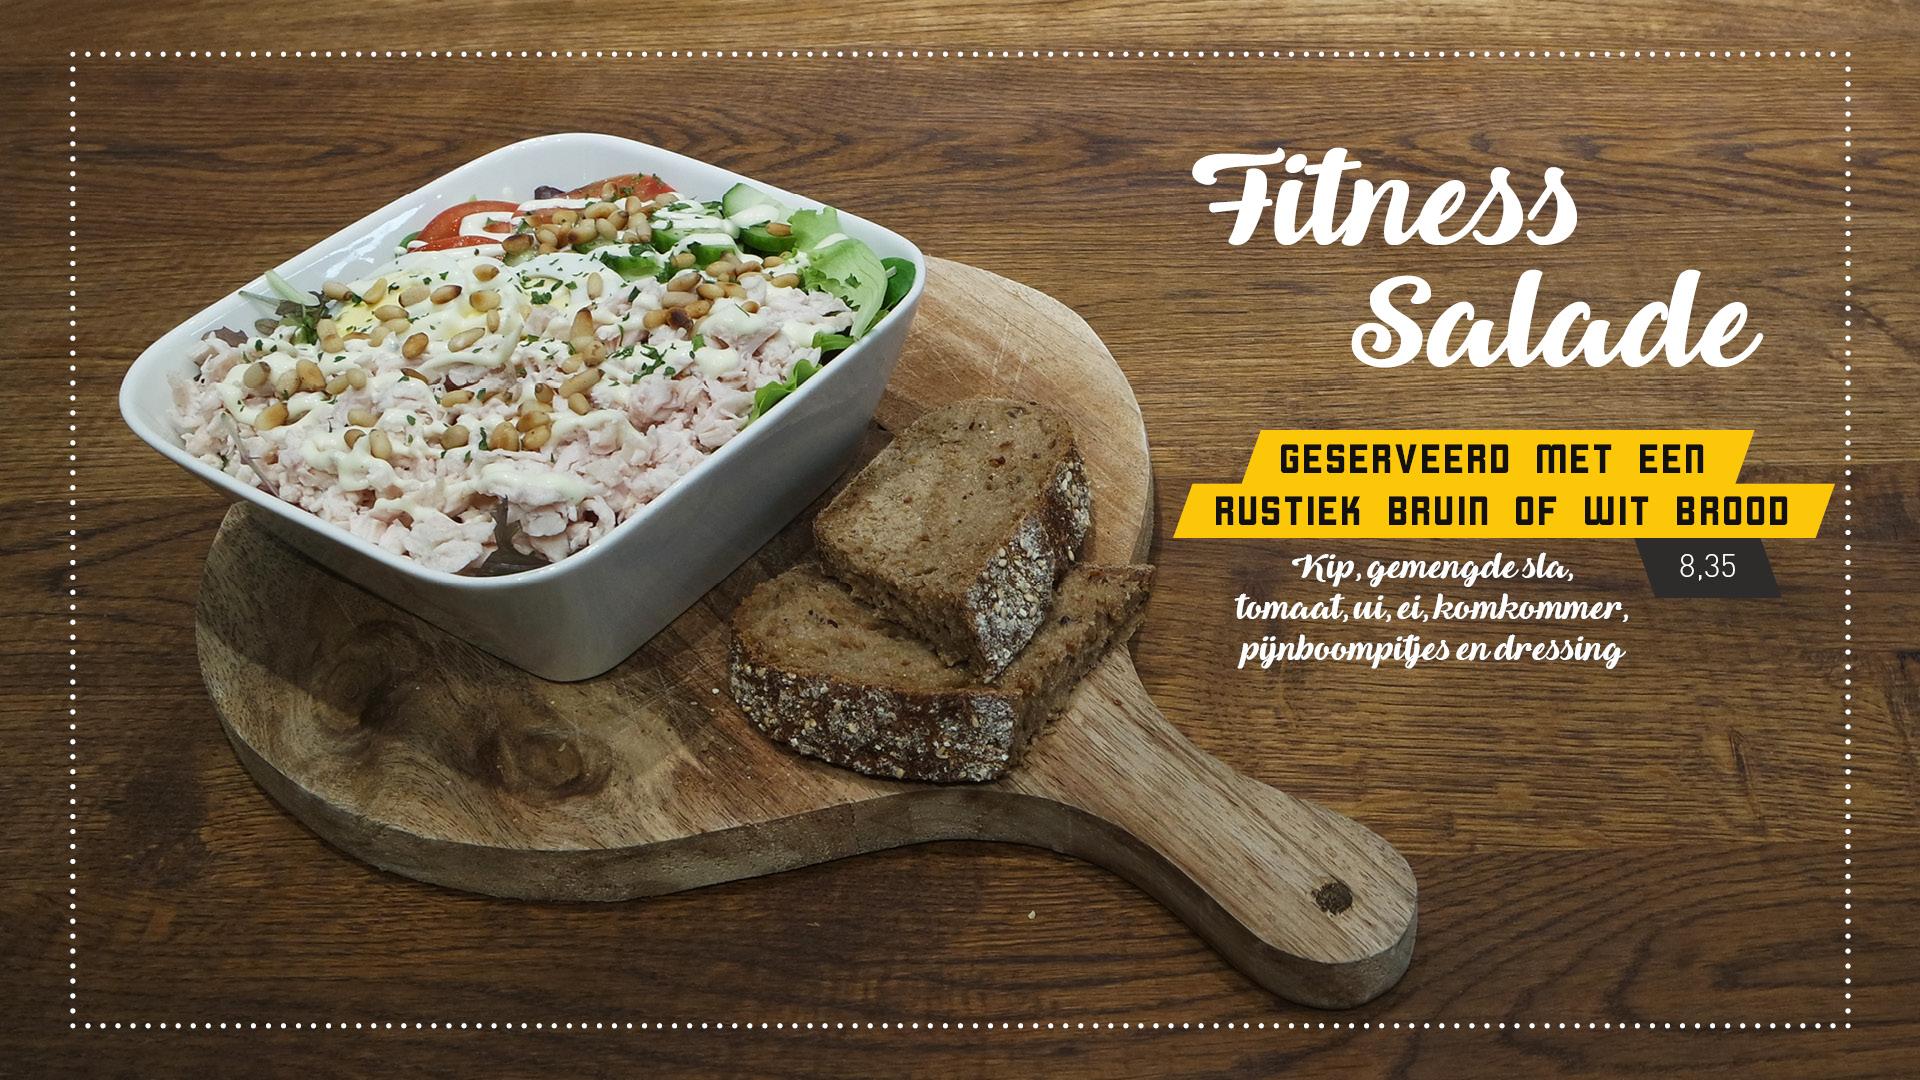 fitness-salade